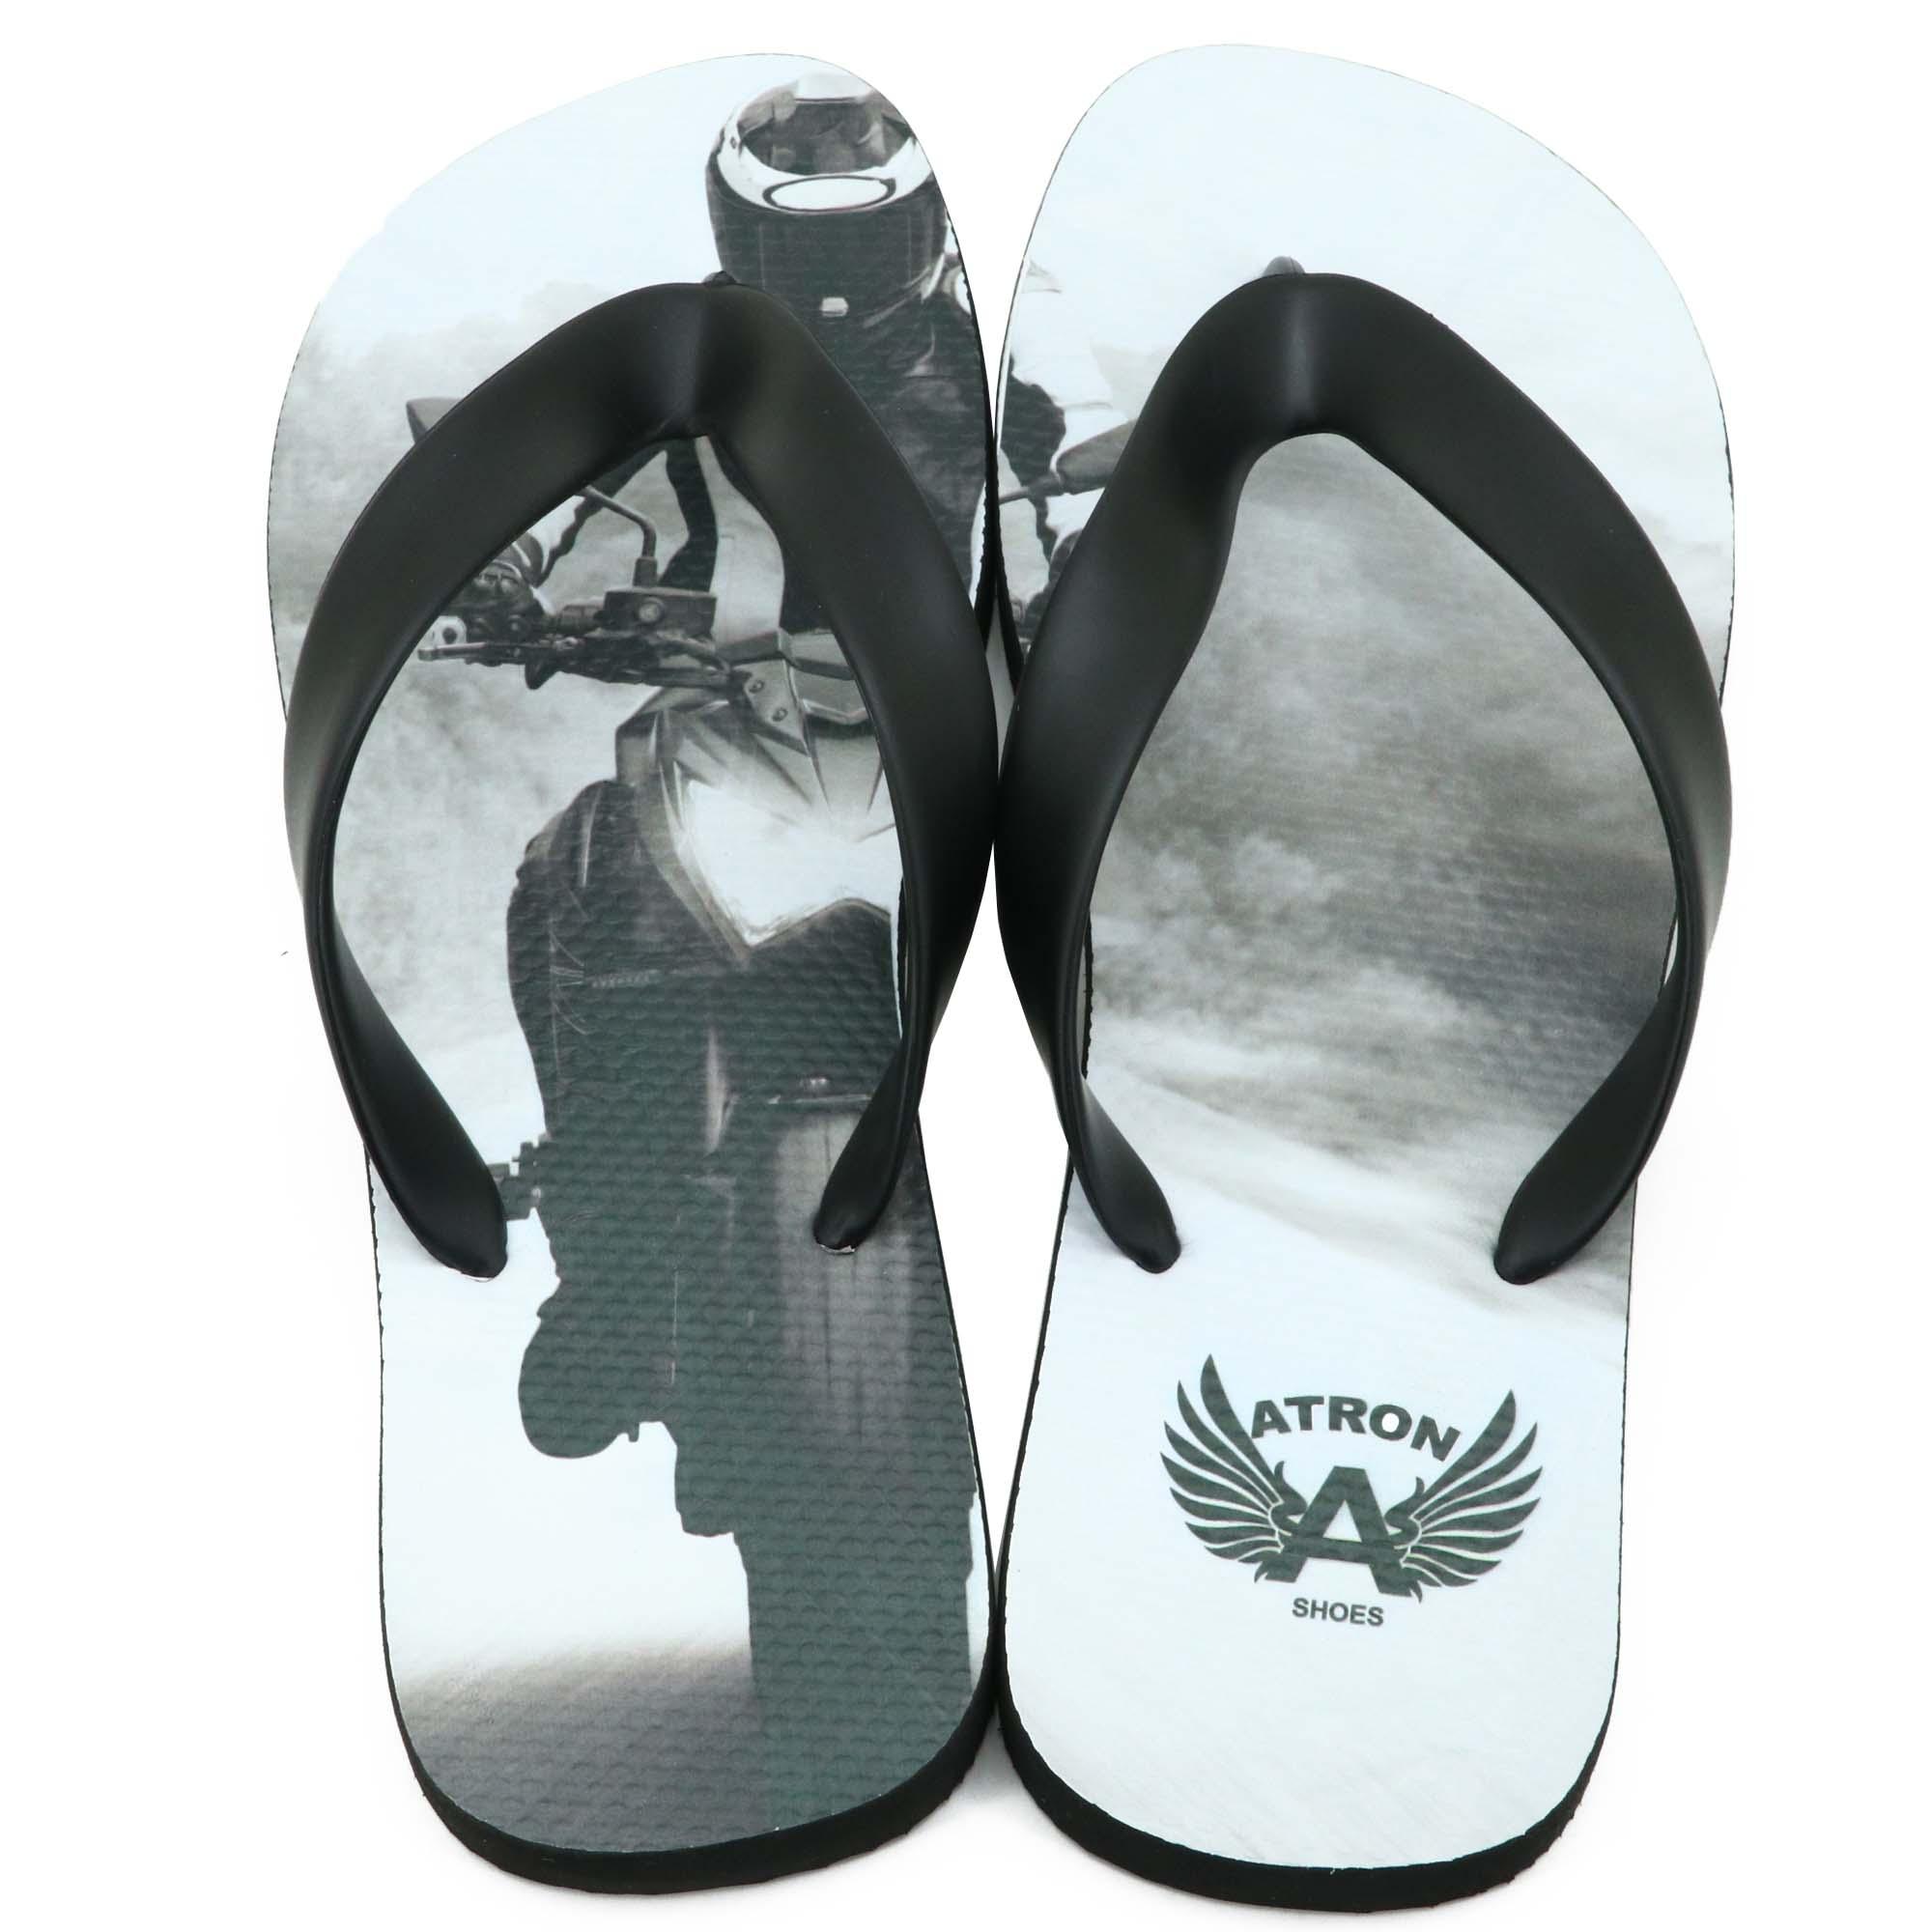 Chinelo Estampa motociclista Atron Shoes